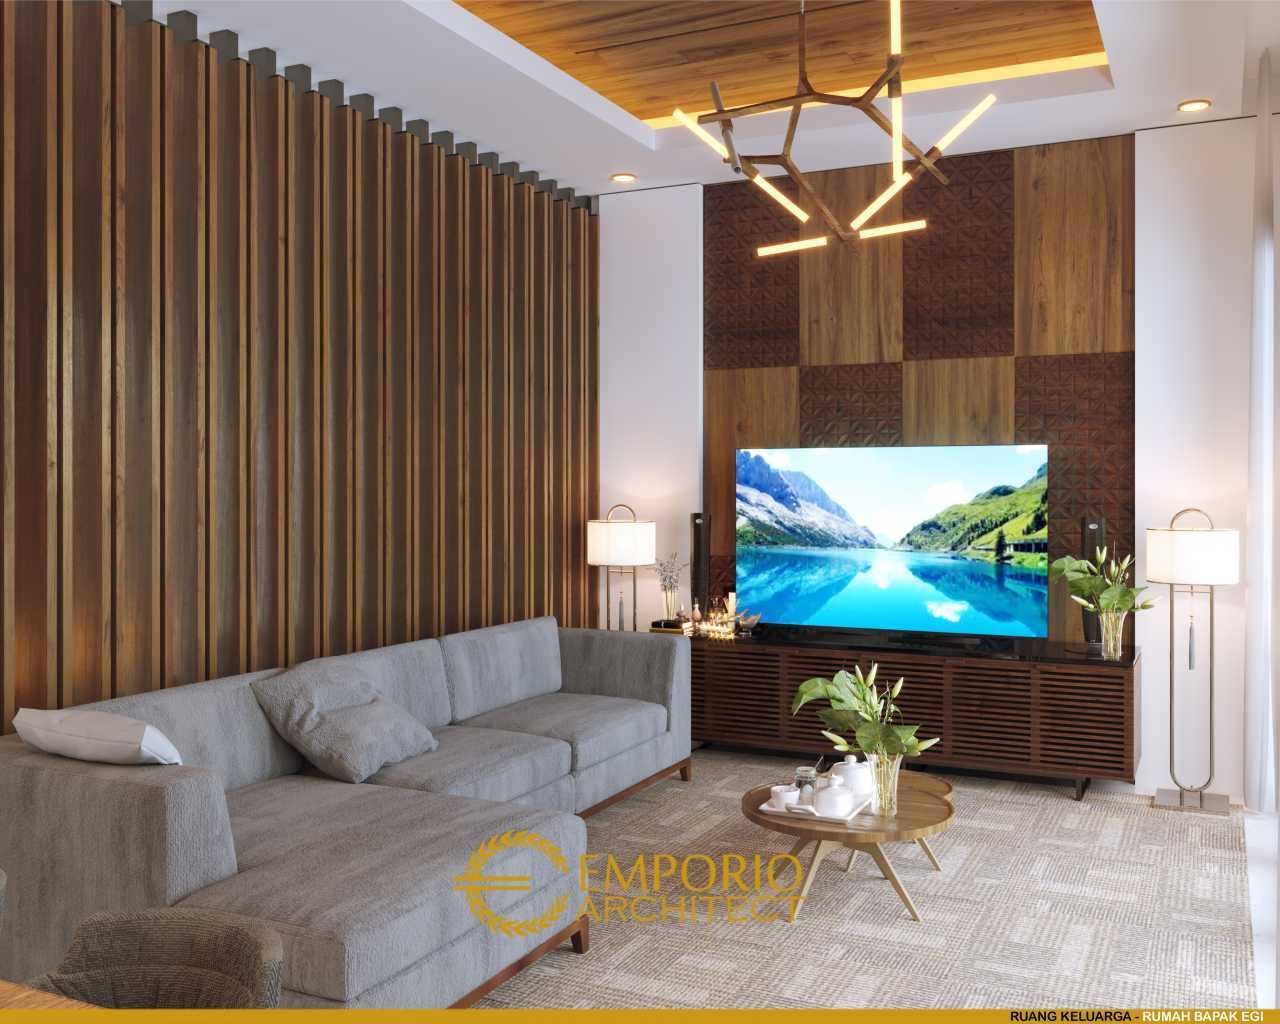 Emporio Architect Jasa Arsitek Denpasar Desain Rumah Modern Tropis 734 @ Denpasar, Bali Kota Denpasar, Bali, Indonesia Kota Denpasar, Bali, Indonesia Emporio-Architect-Jasa-Arsitek-Denpasar-Desain-Rumah-Modern-Tropis-734-Denpasar-Bali   85481